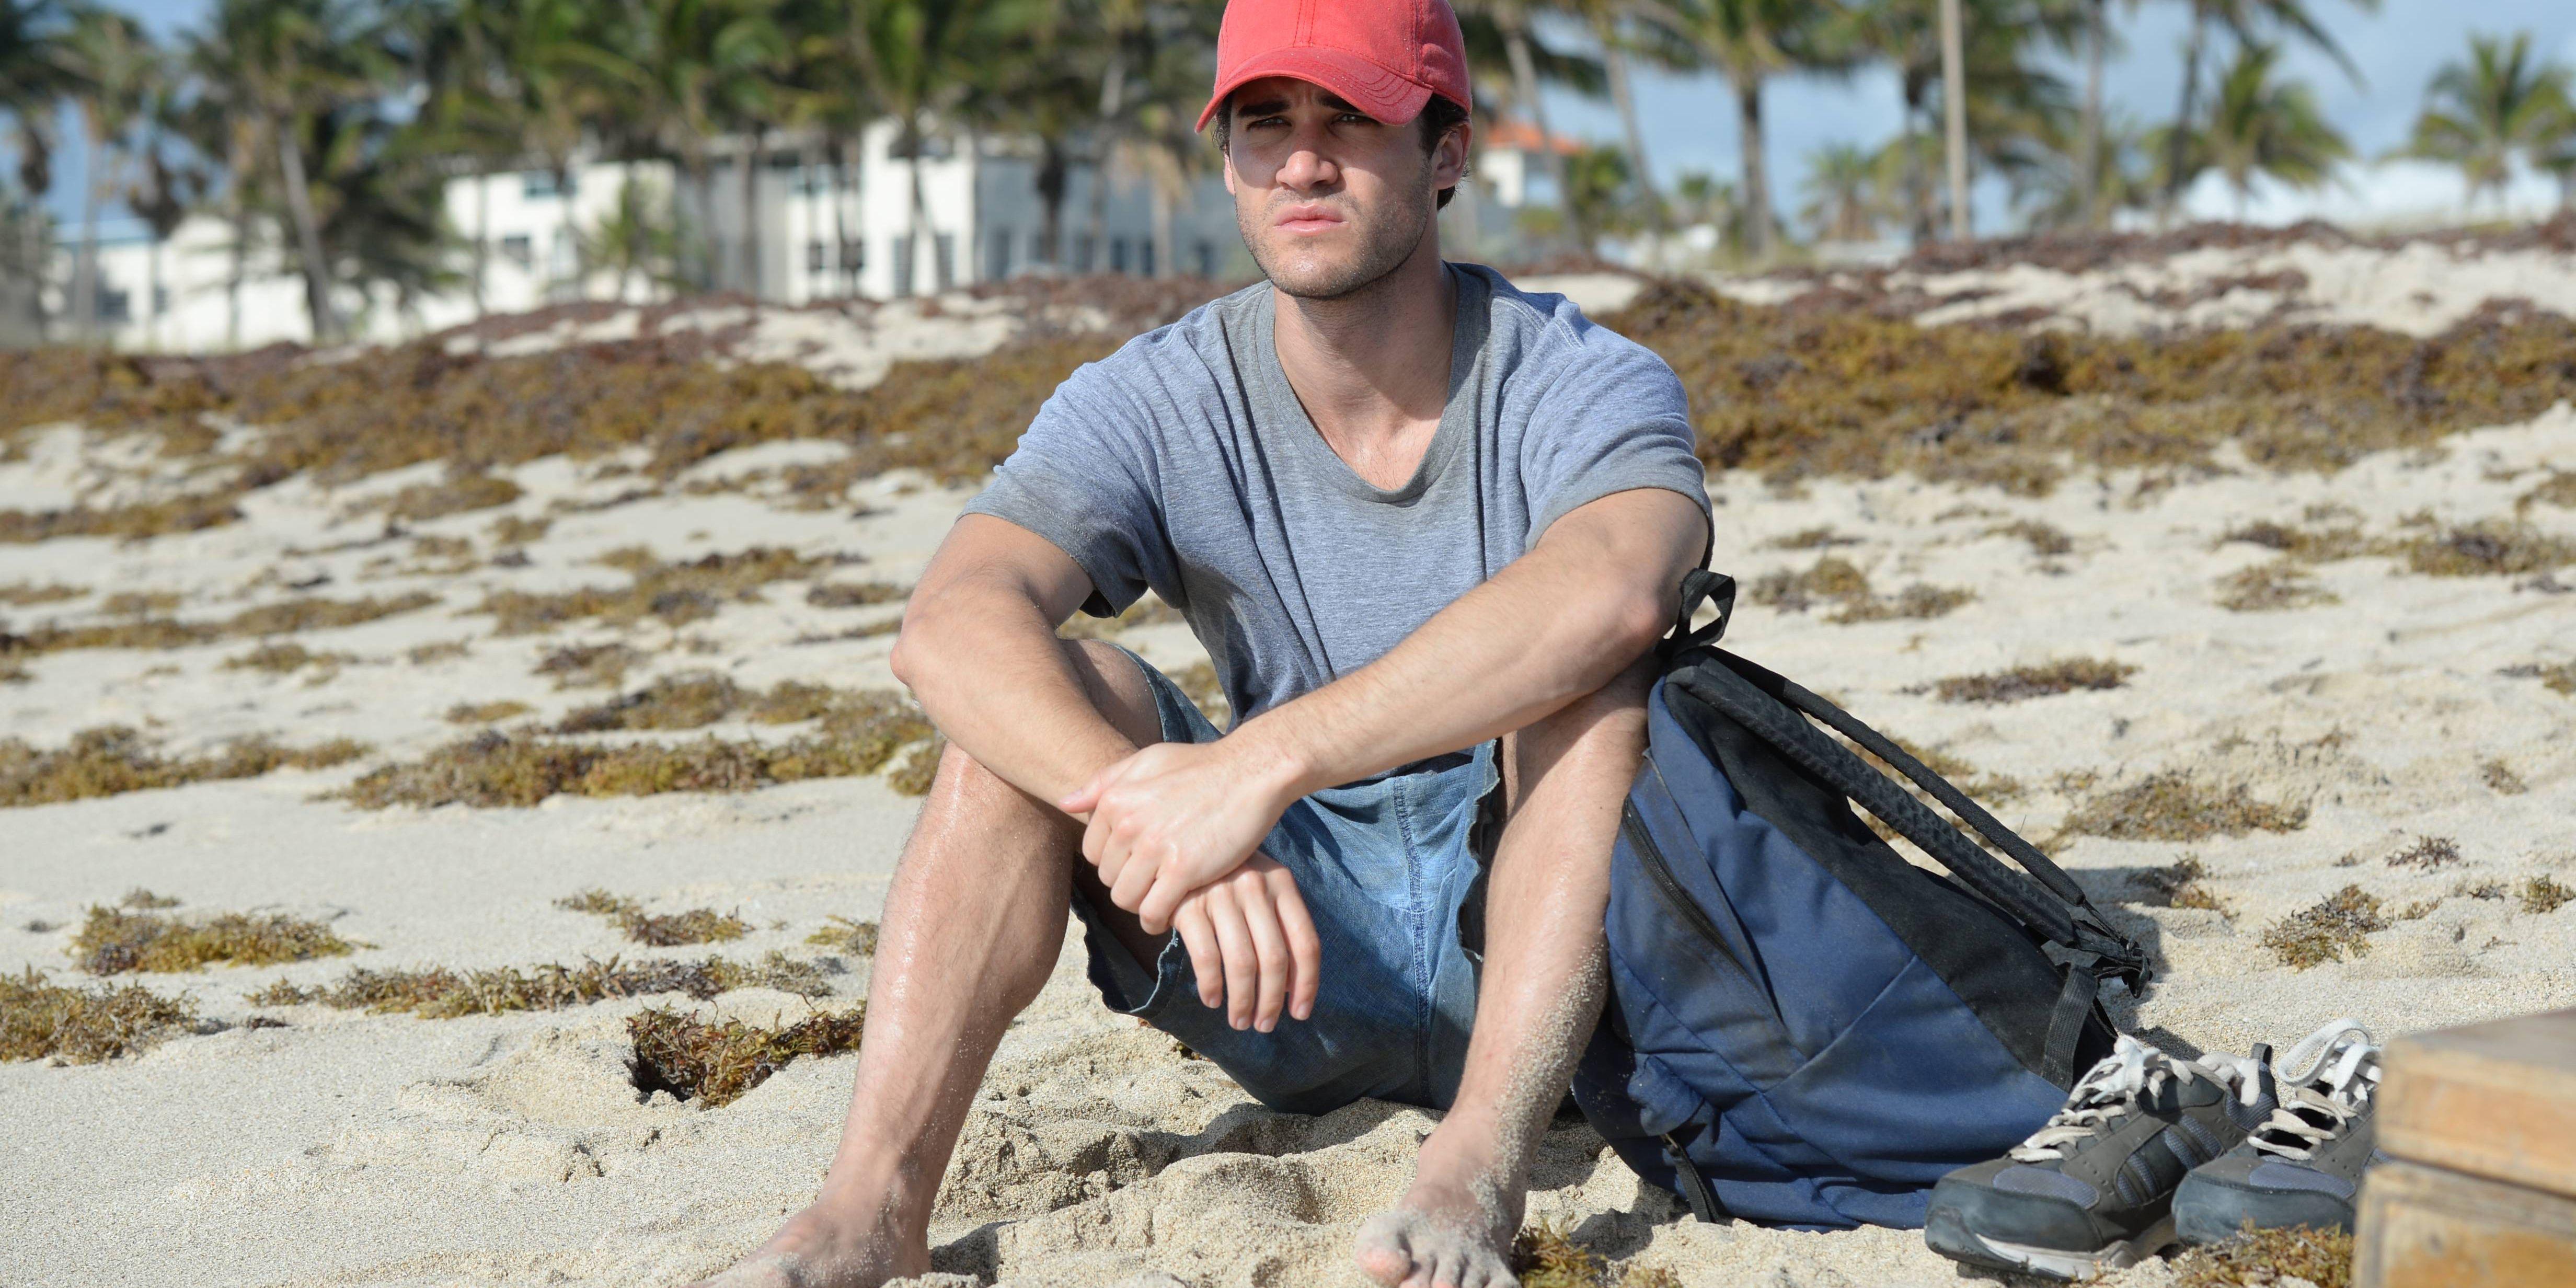 American Crime Story Gianni Versace Andrew Cunanan Darren Criss beach hat